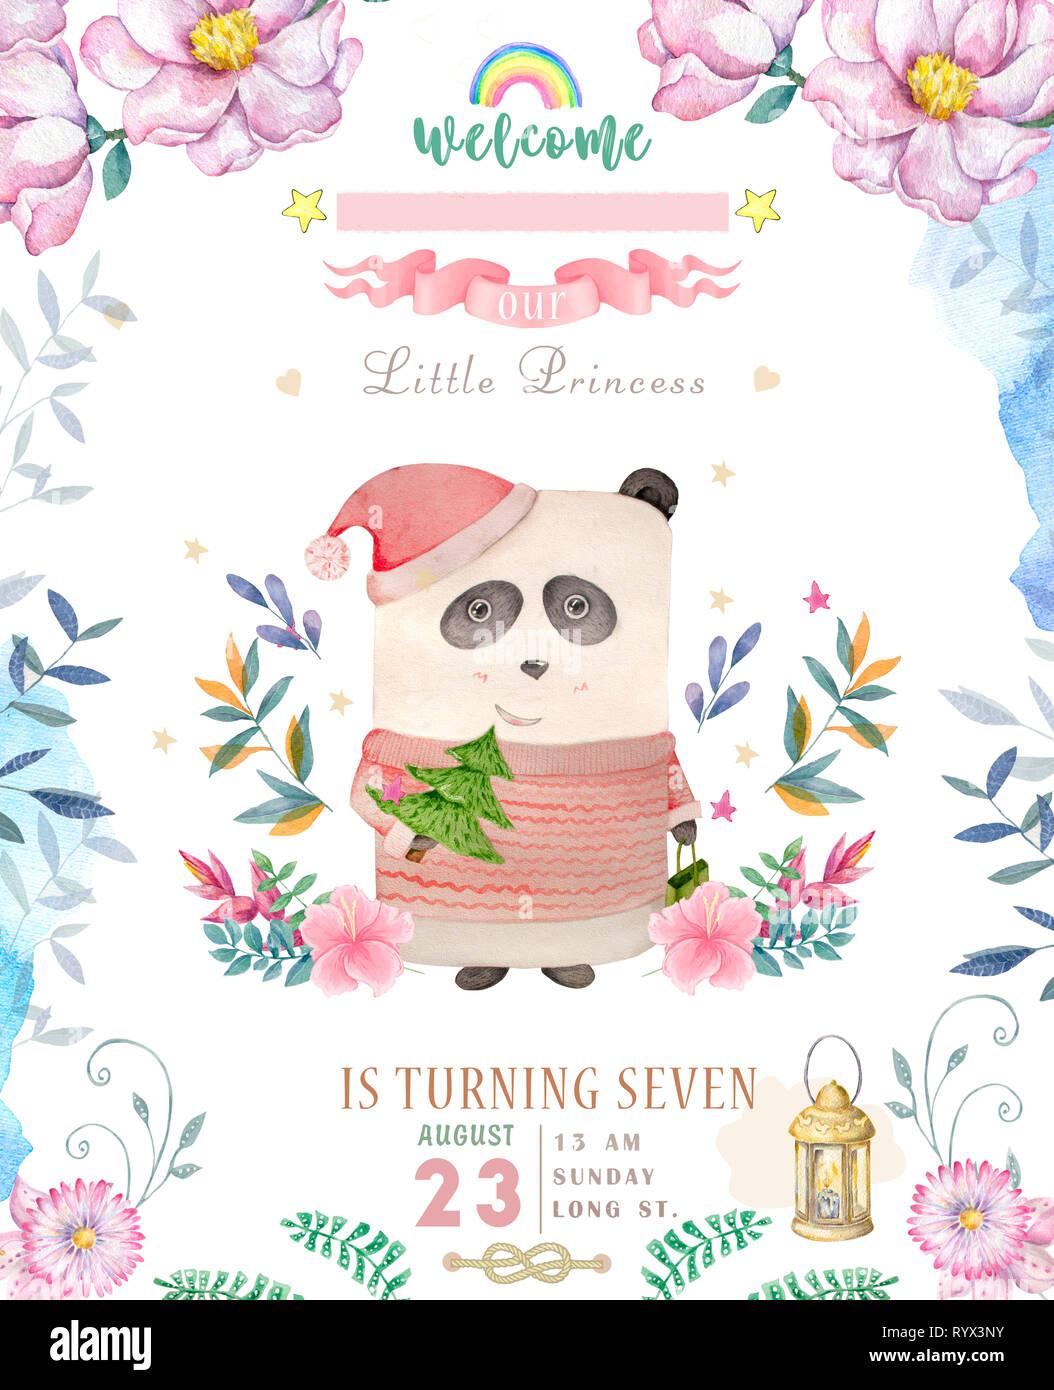 Happy Birthday Card With Cute Panda Bear. Vector Illustration. Royalty Free  Cliparts, Vectors, And Stock Illustration. Image 78624403.